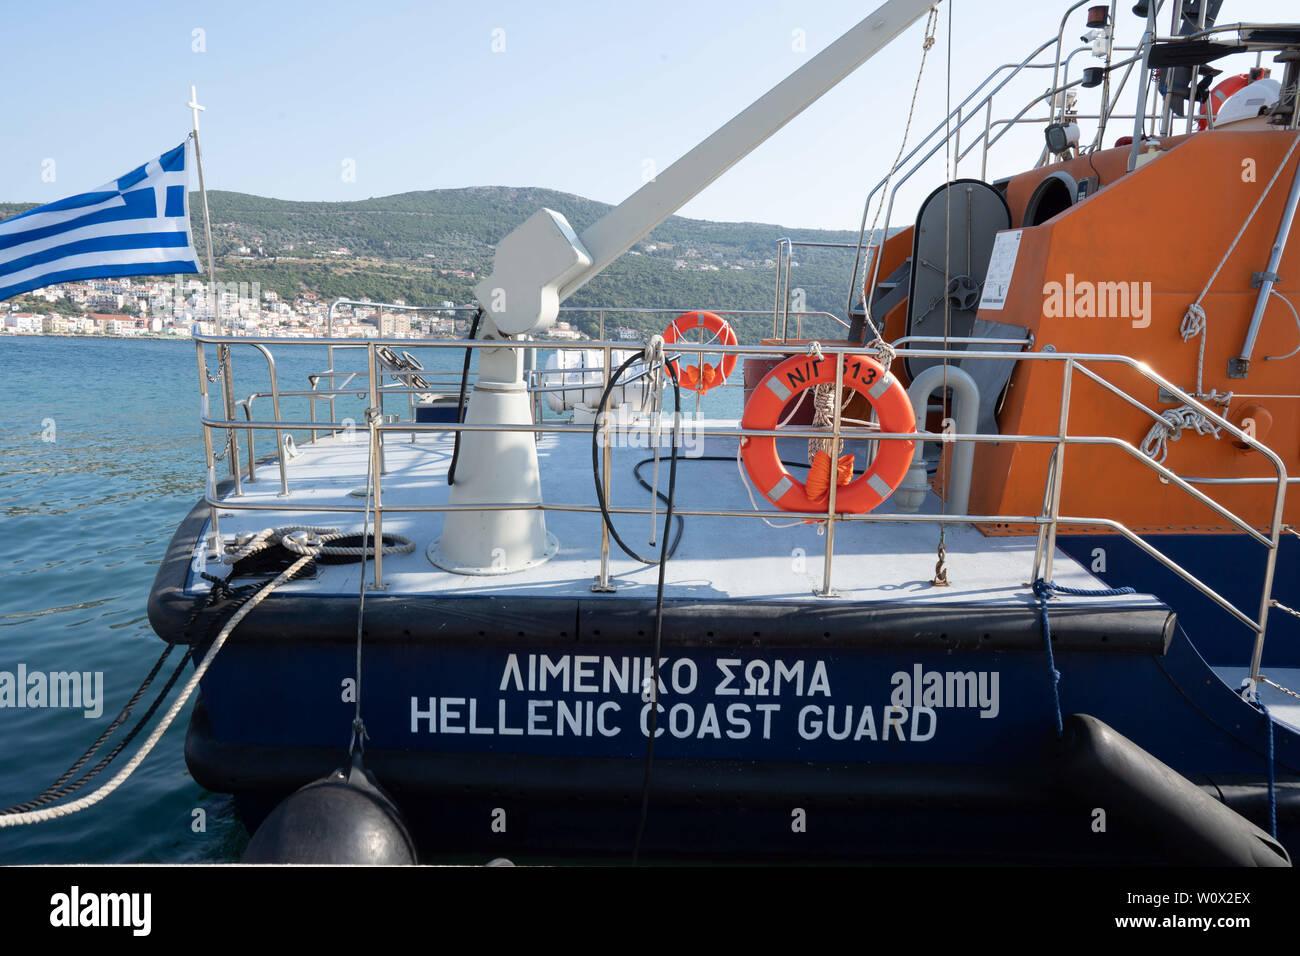 June 26, 2019 - Samos, Greece - A coast guard ship docked at